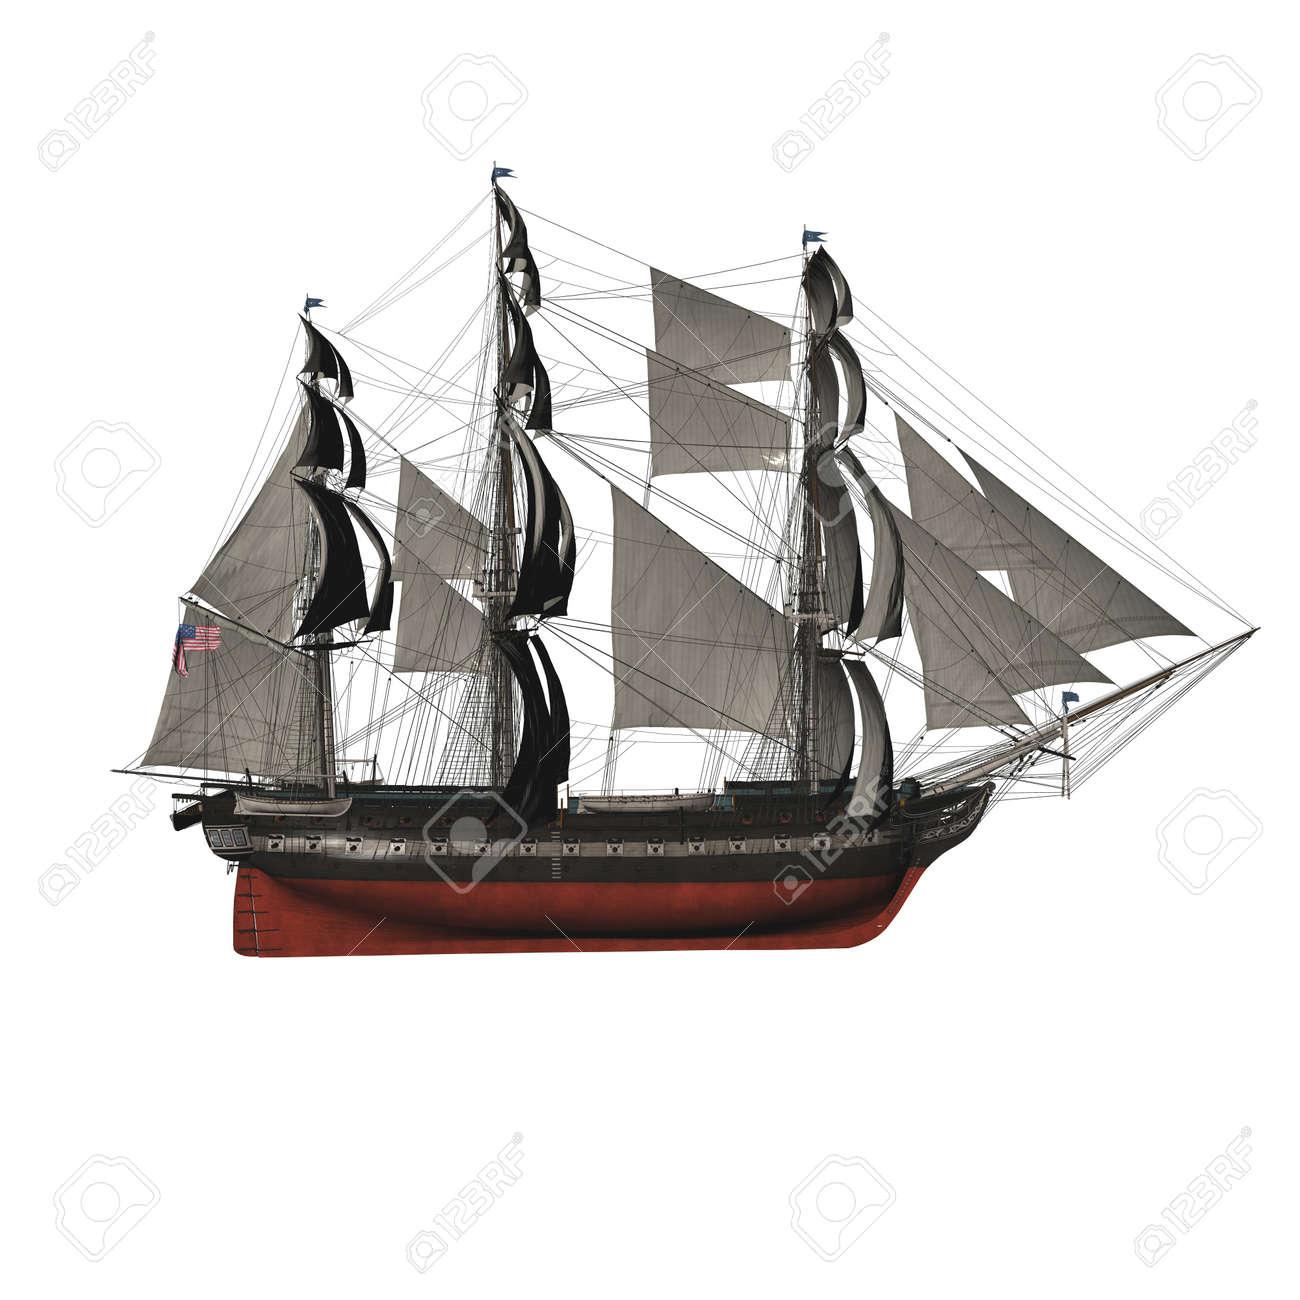 Sailing vessel in the sea Stock Photo - 4316730